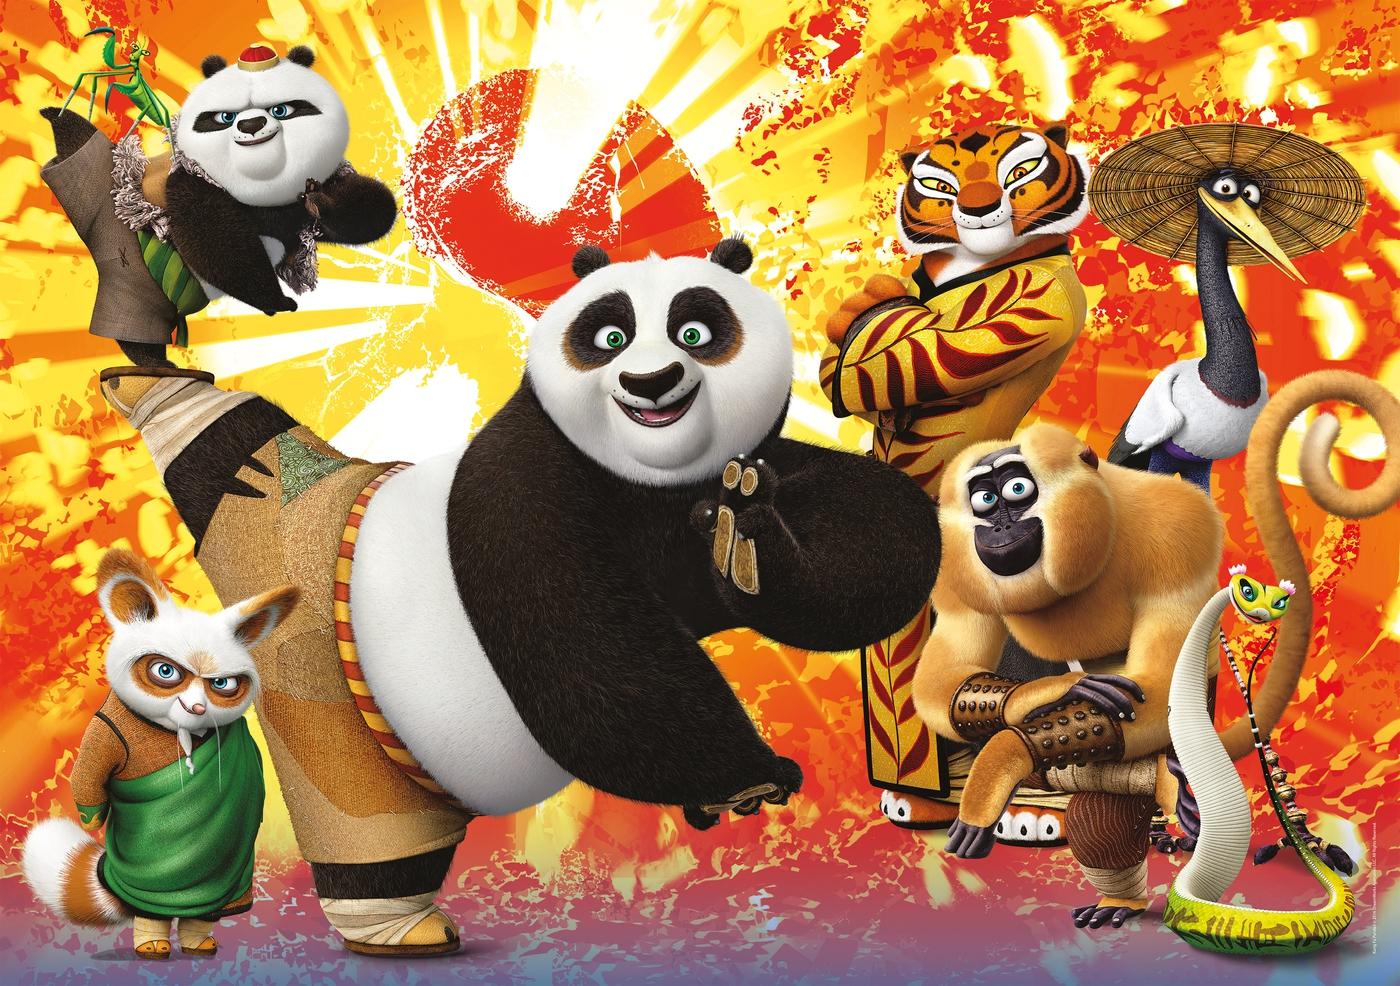 совершенно все картинки кунг-фу панда помню как